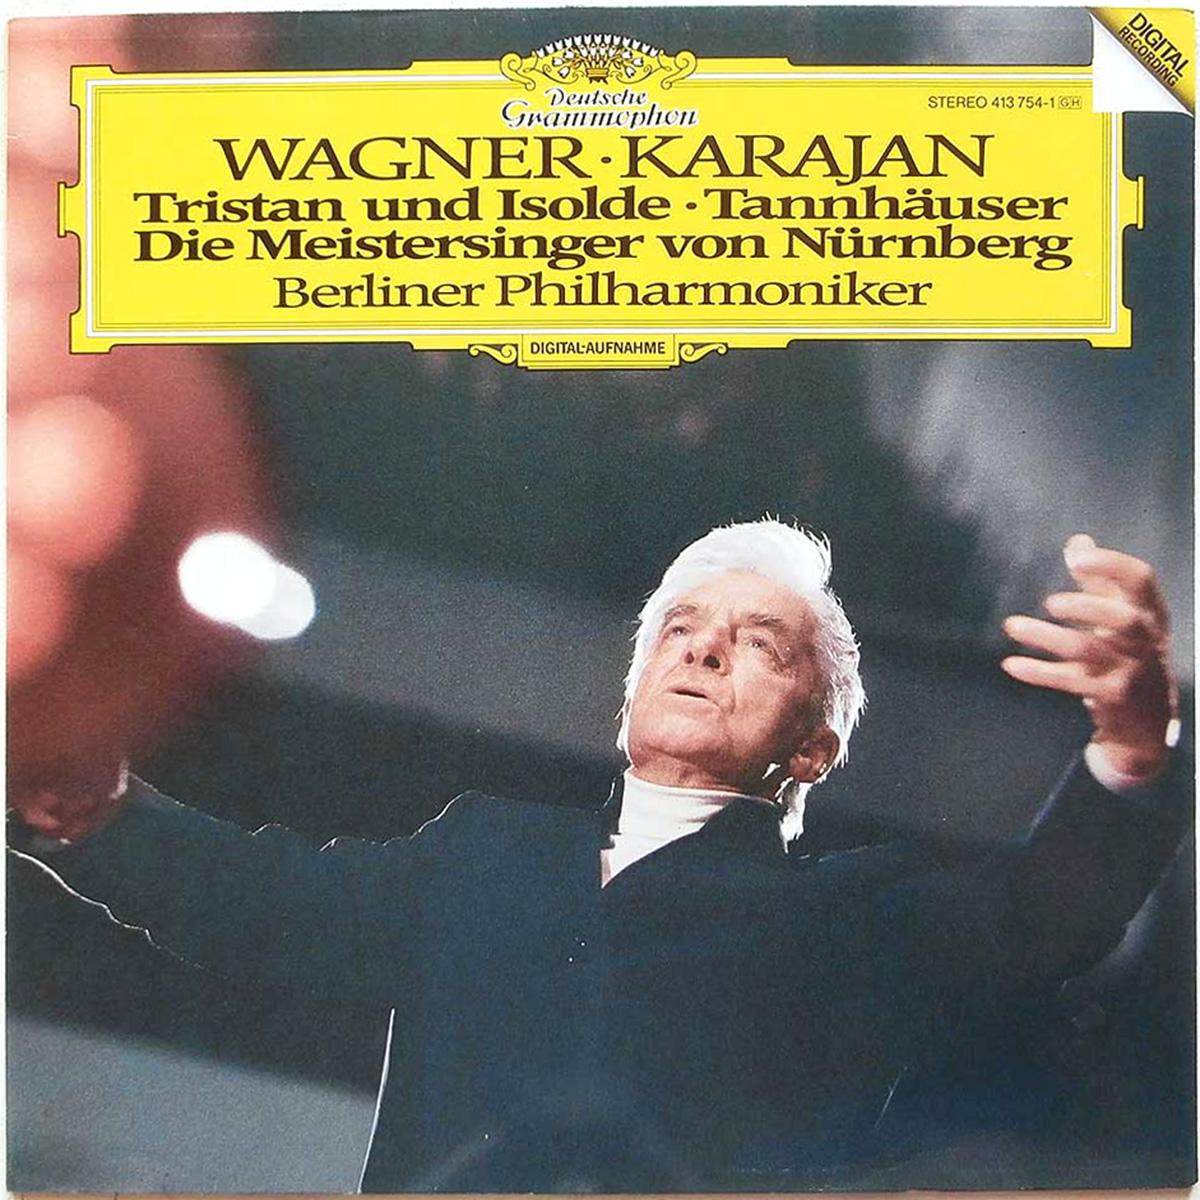 DGG 413 754 Wagner Tristan Und Isolde Tannhauser Meistersingers Karajan DGG Digital Aufnahme